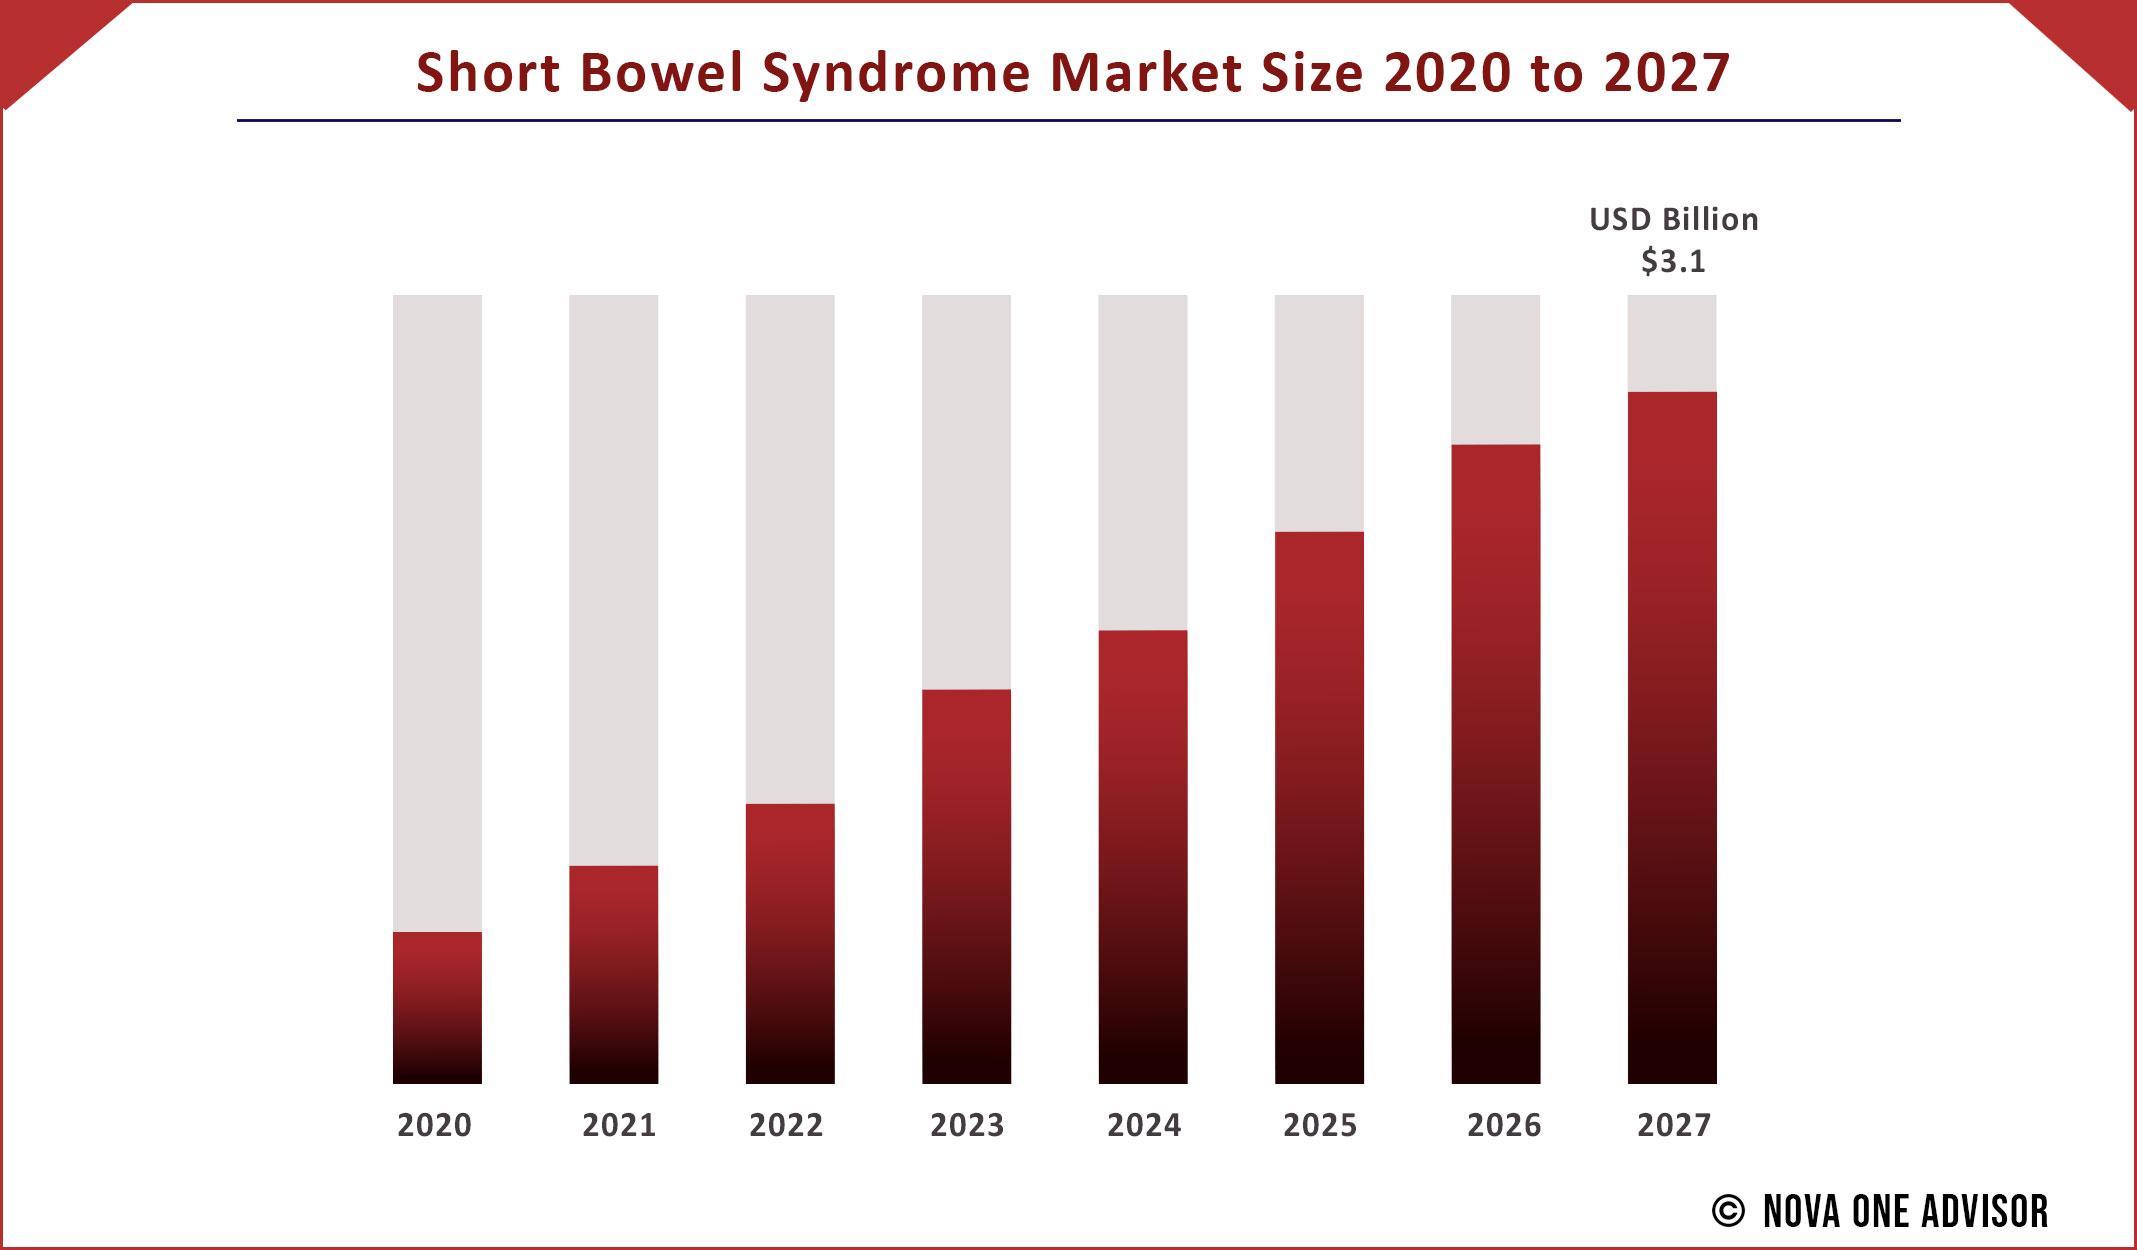 Short Bowel Syndrome Market Size 2020 to 2027